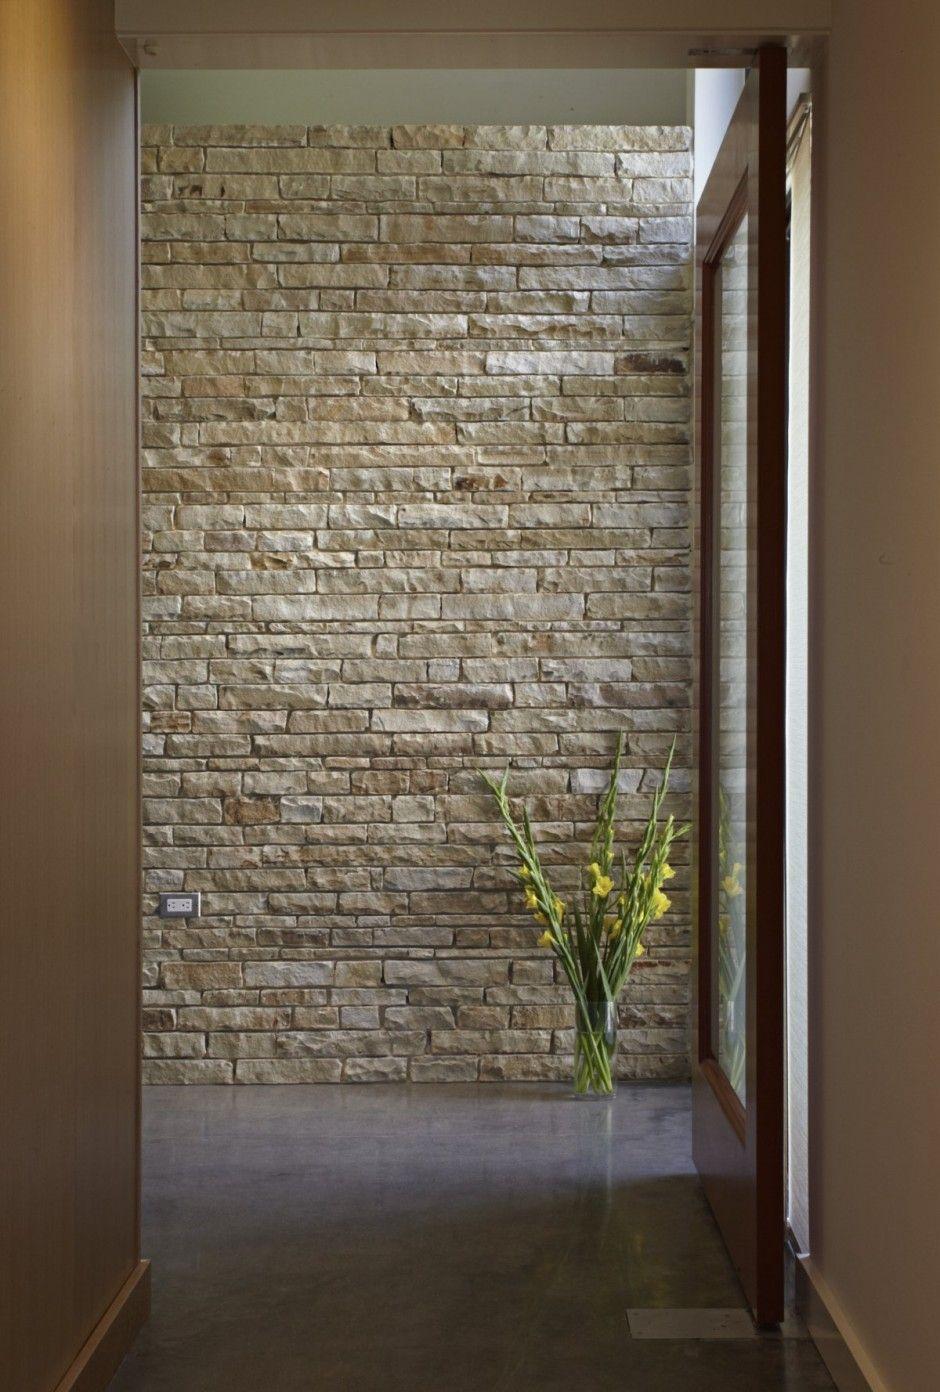 Stonework as art wall idea pinterest foyers bricks and stone